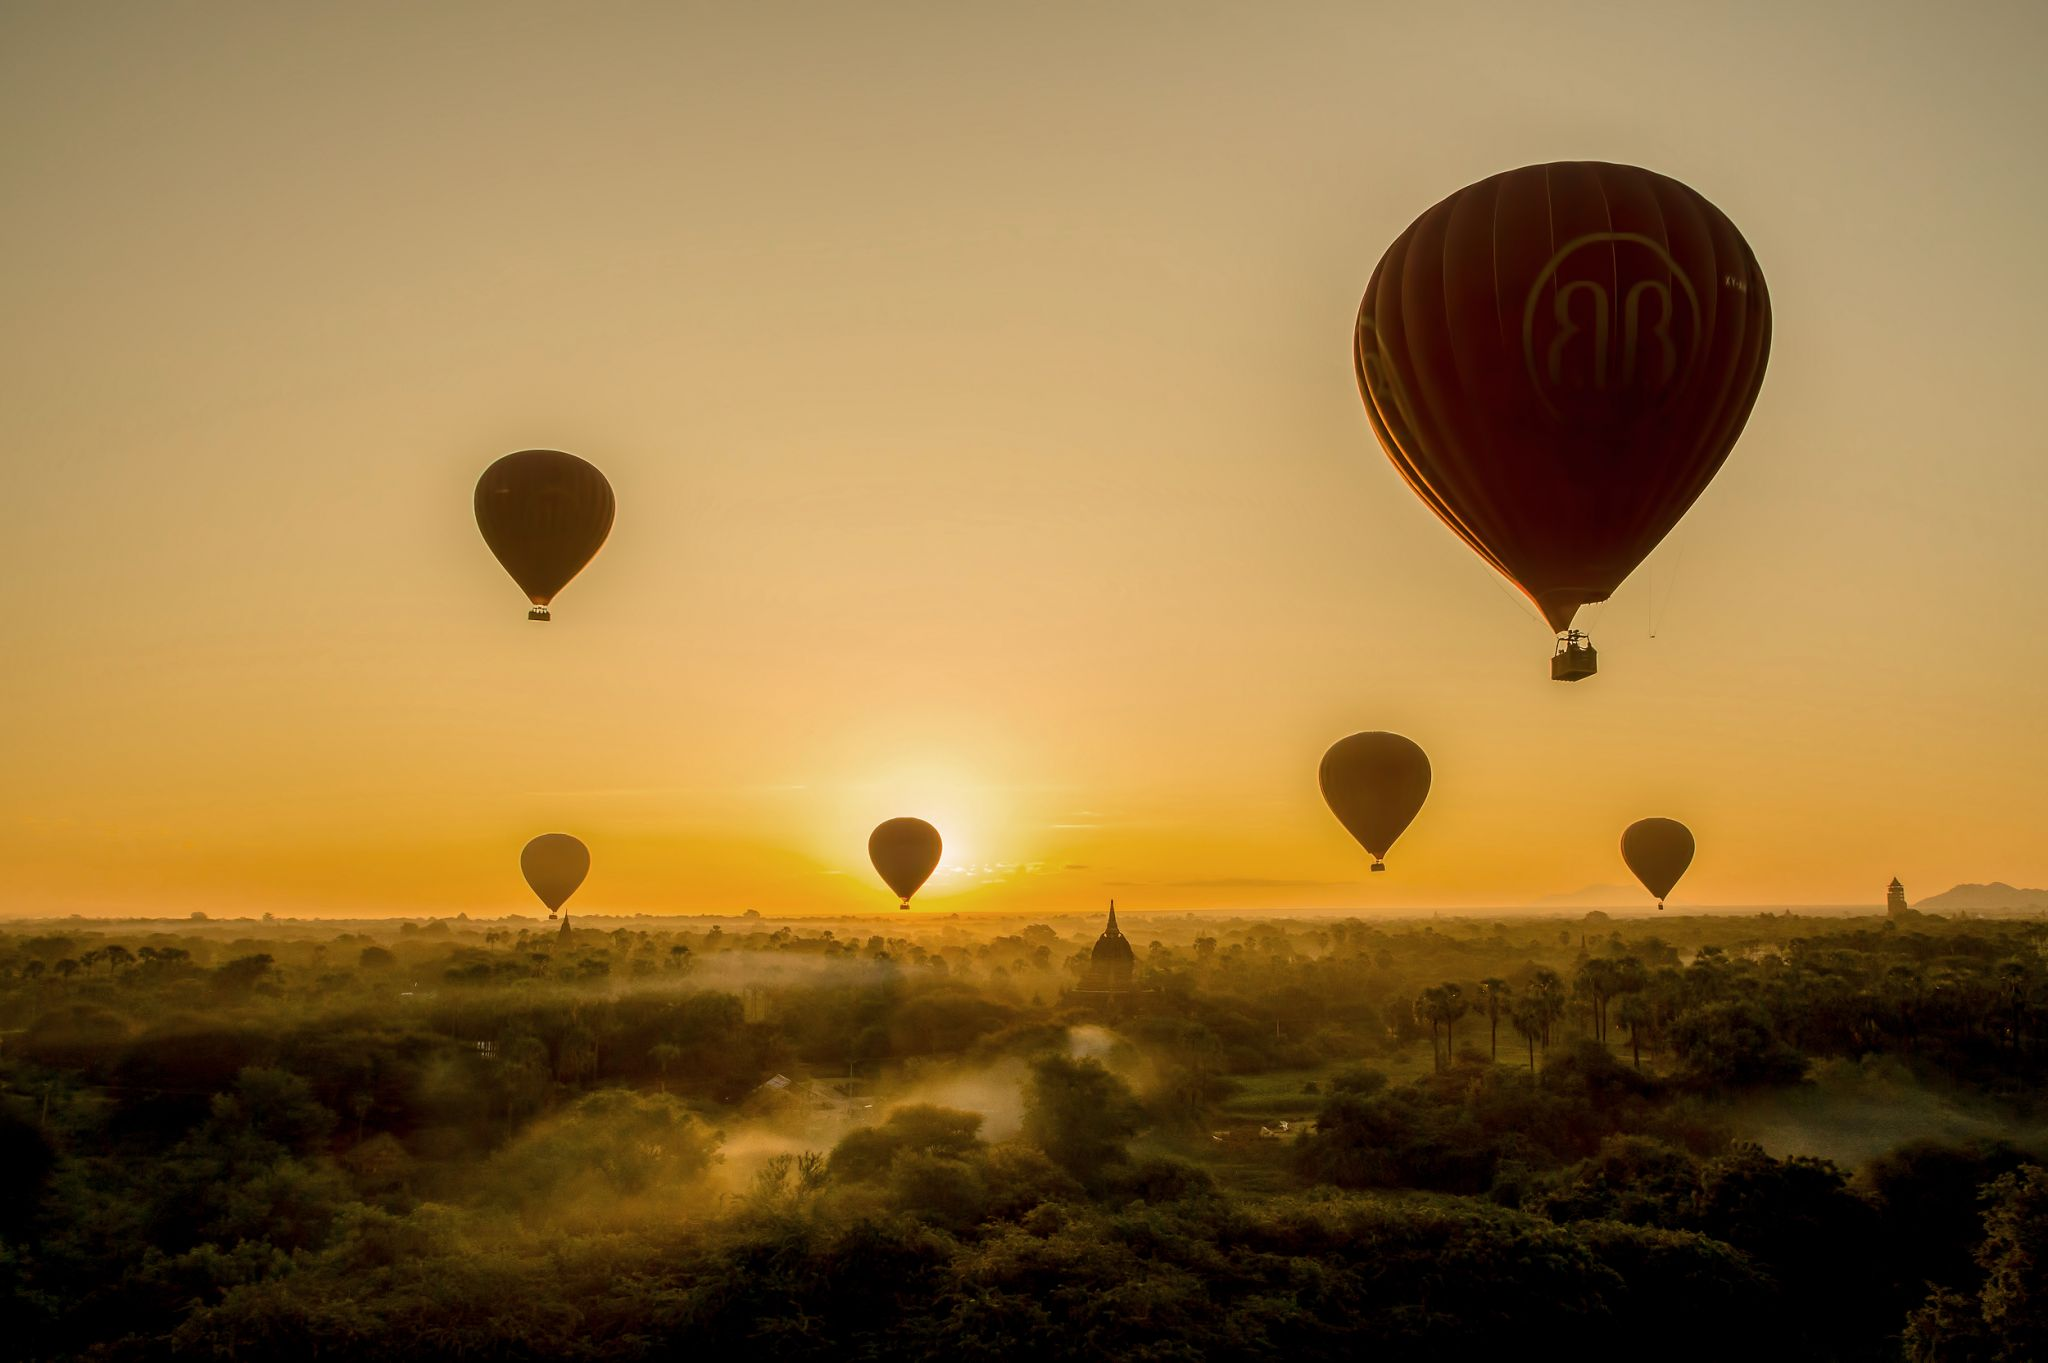 In a balloon over Bagan, Myanmar